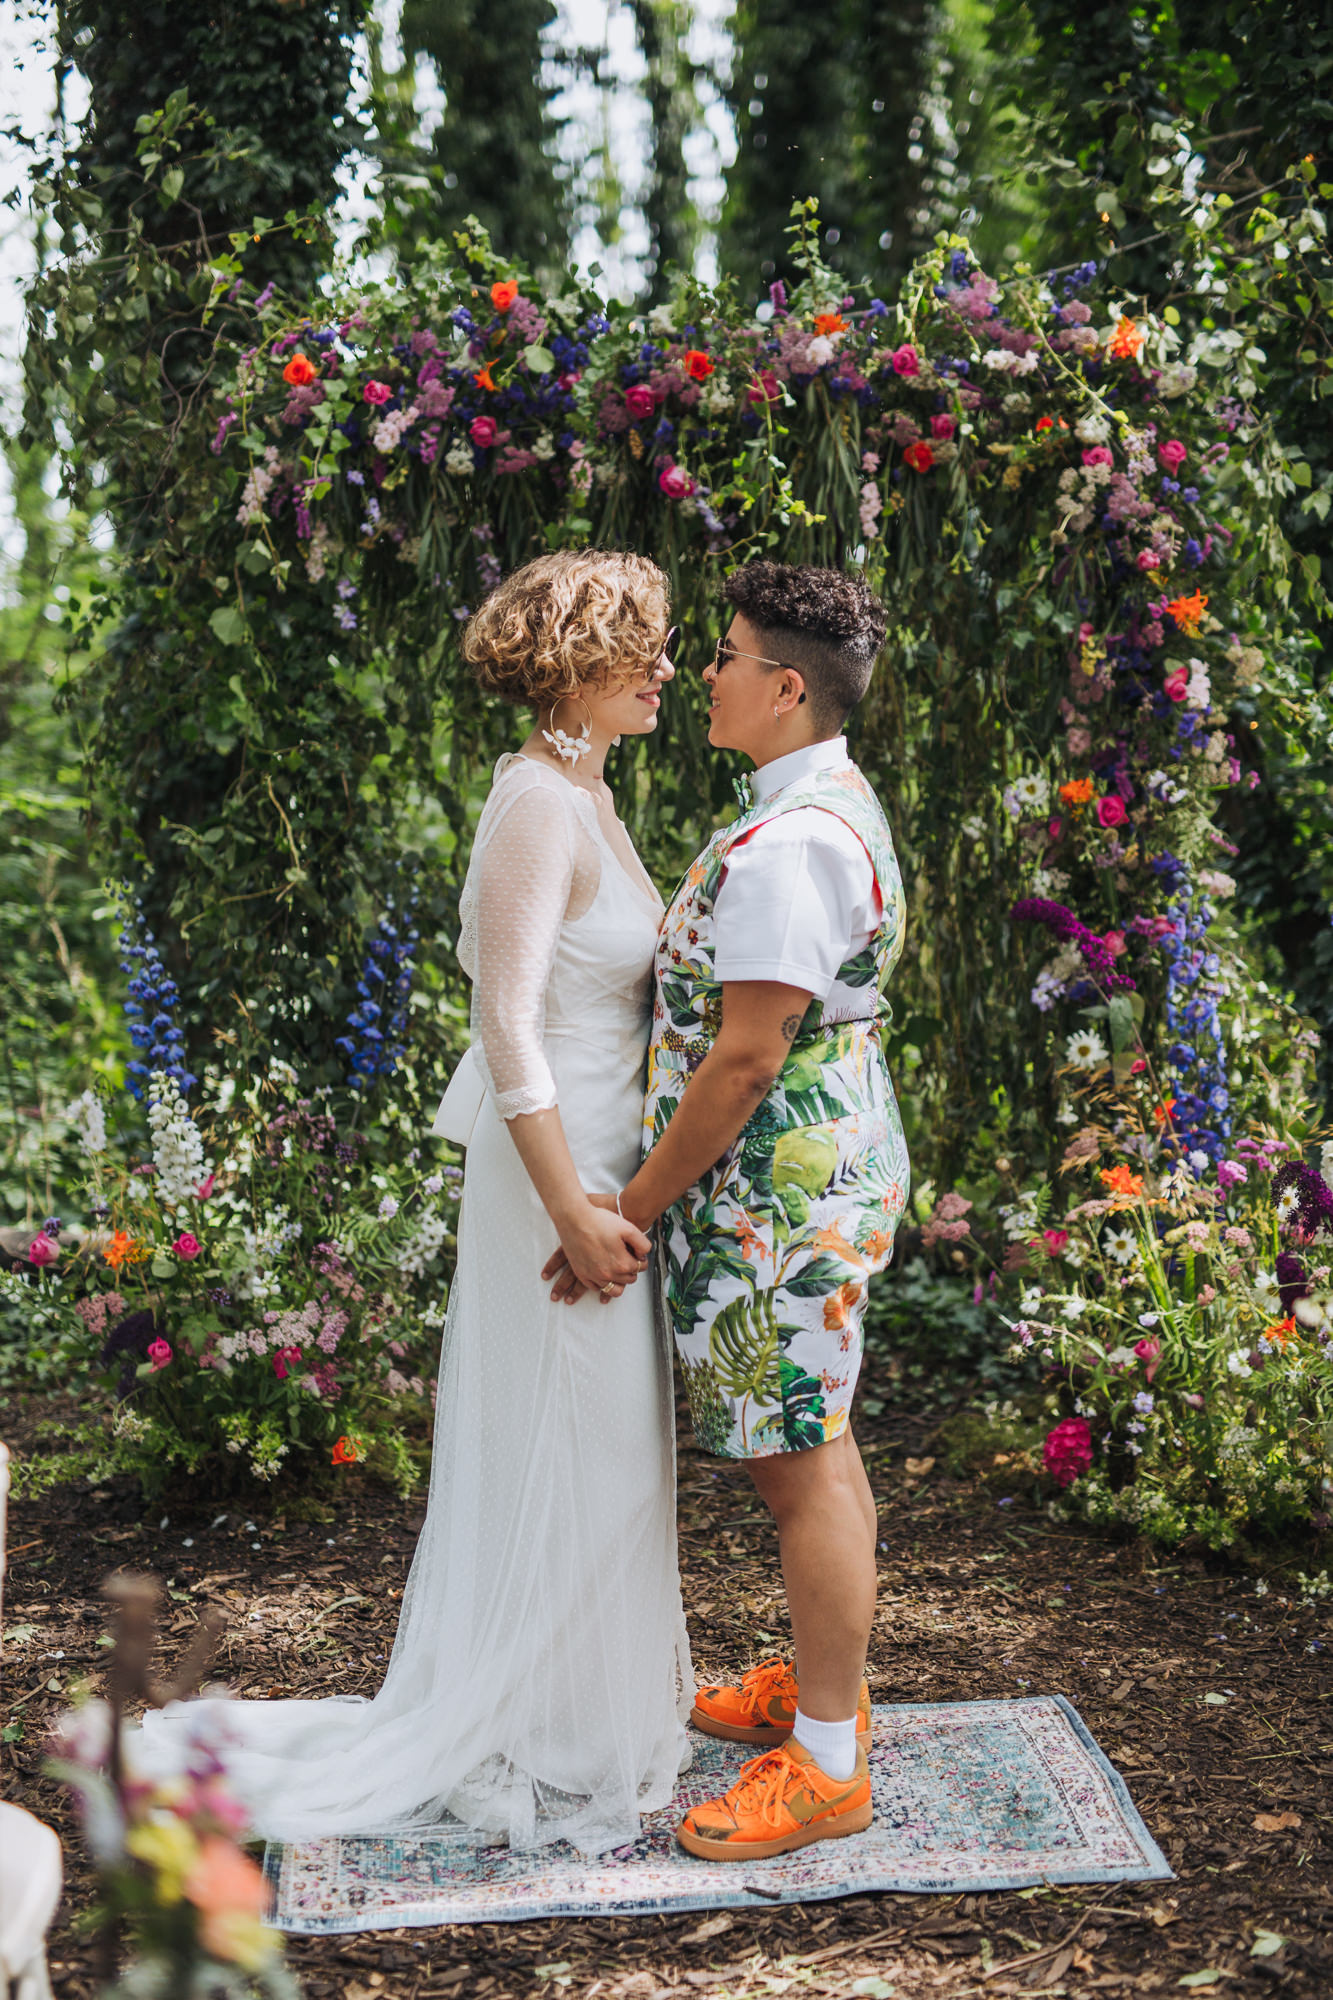 applewood wedding photographer leeds, yorkshire26.jpg